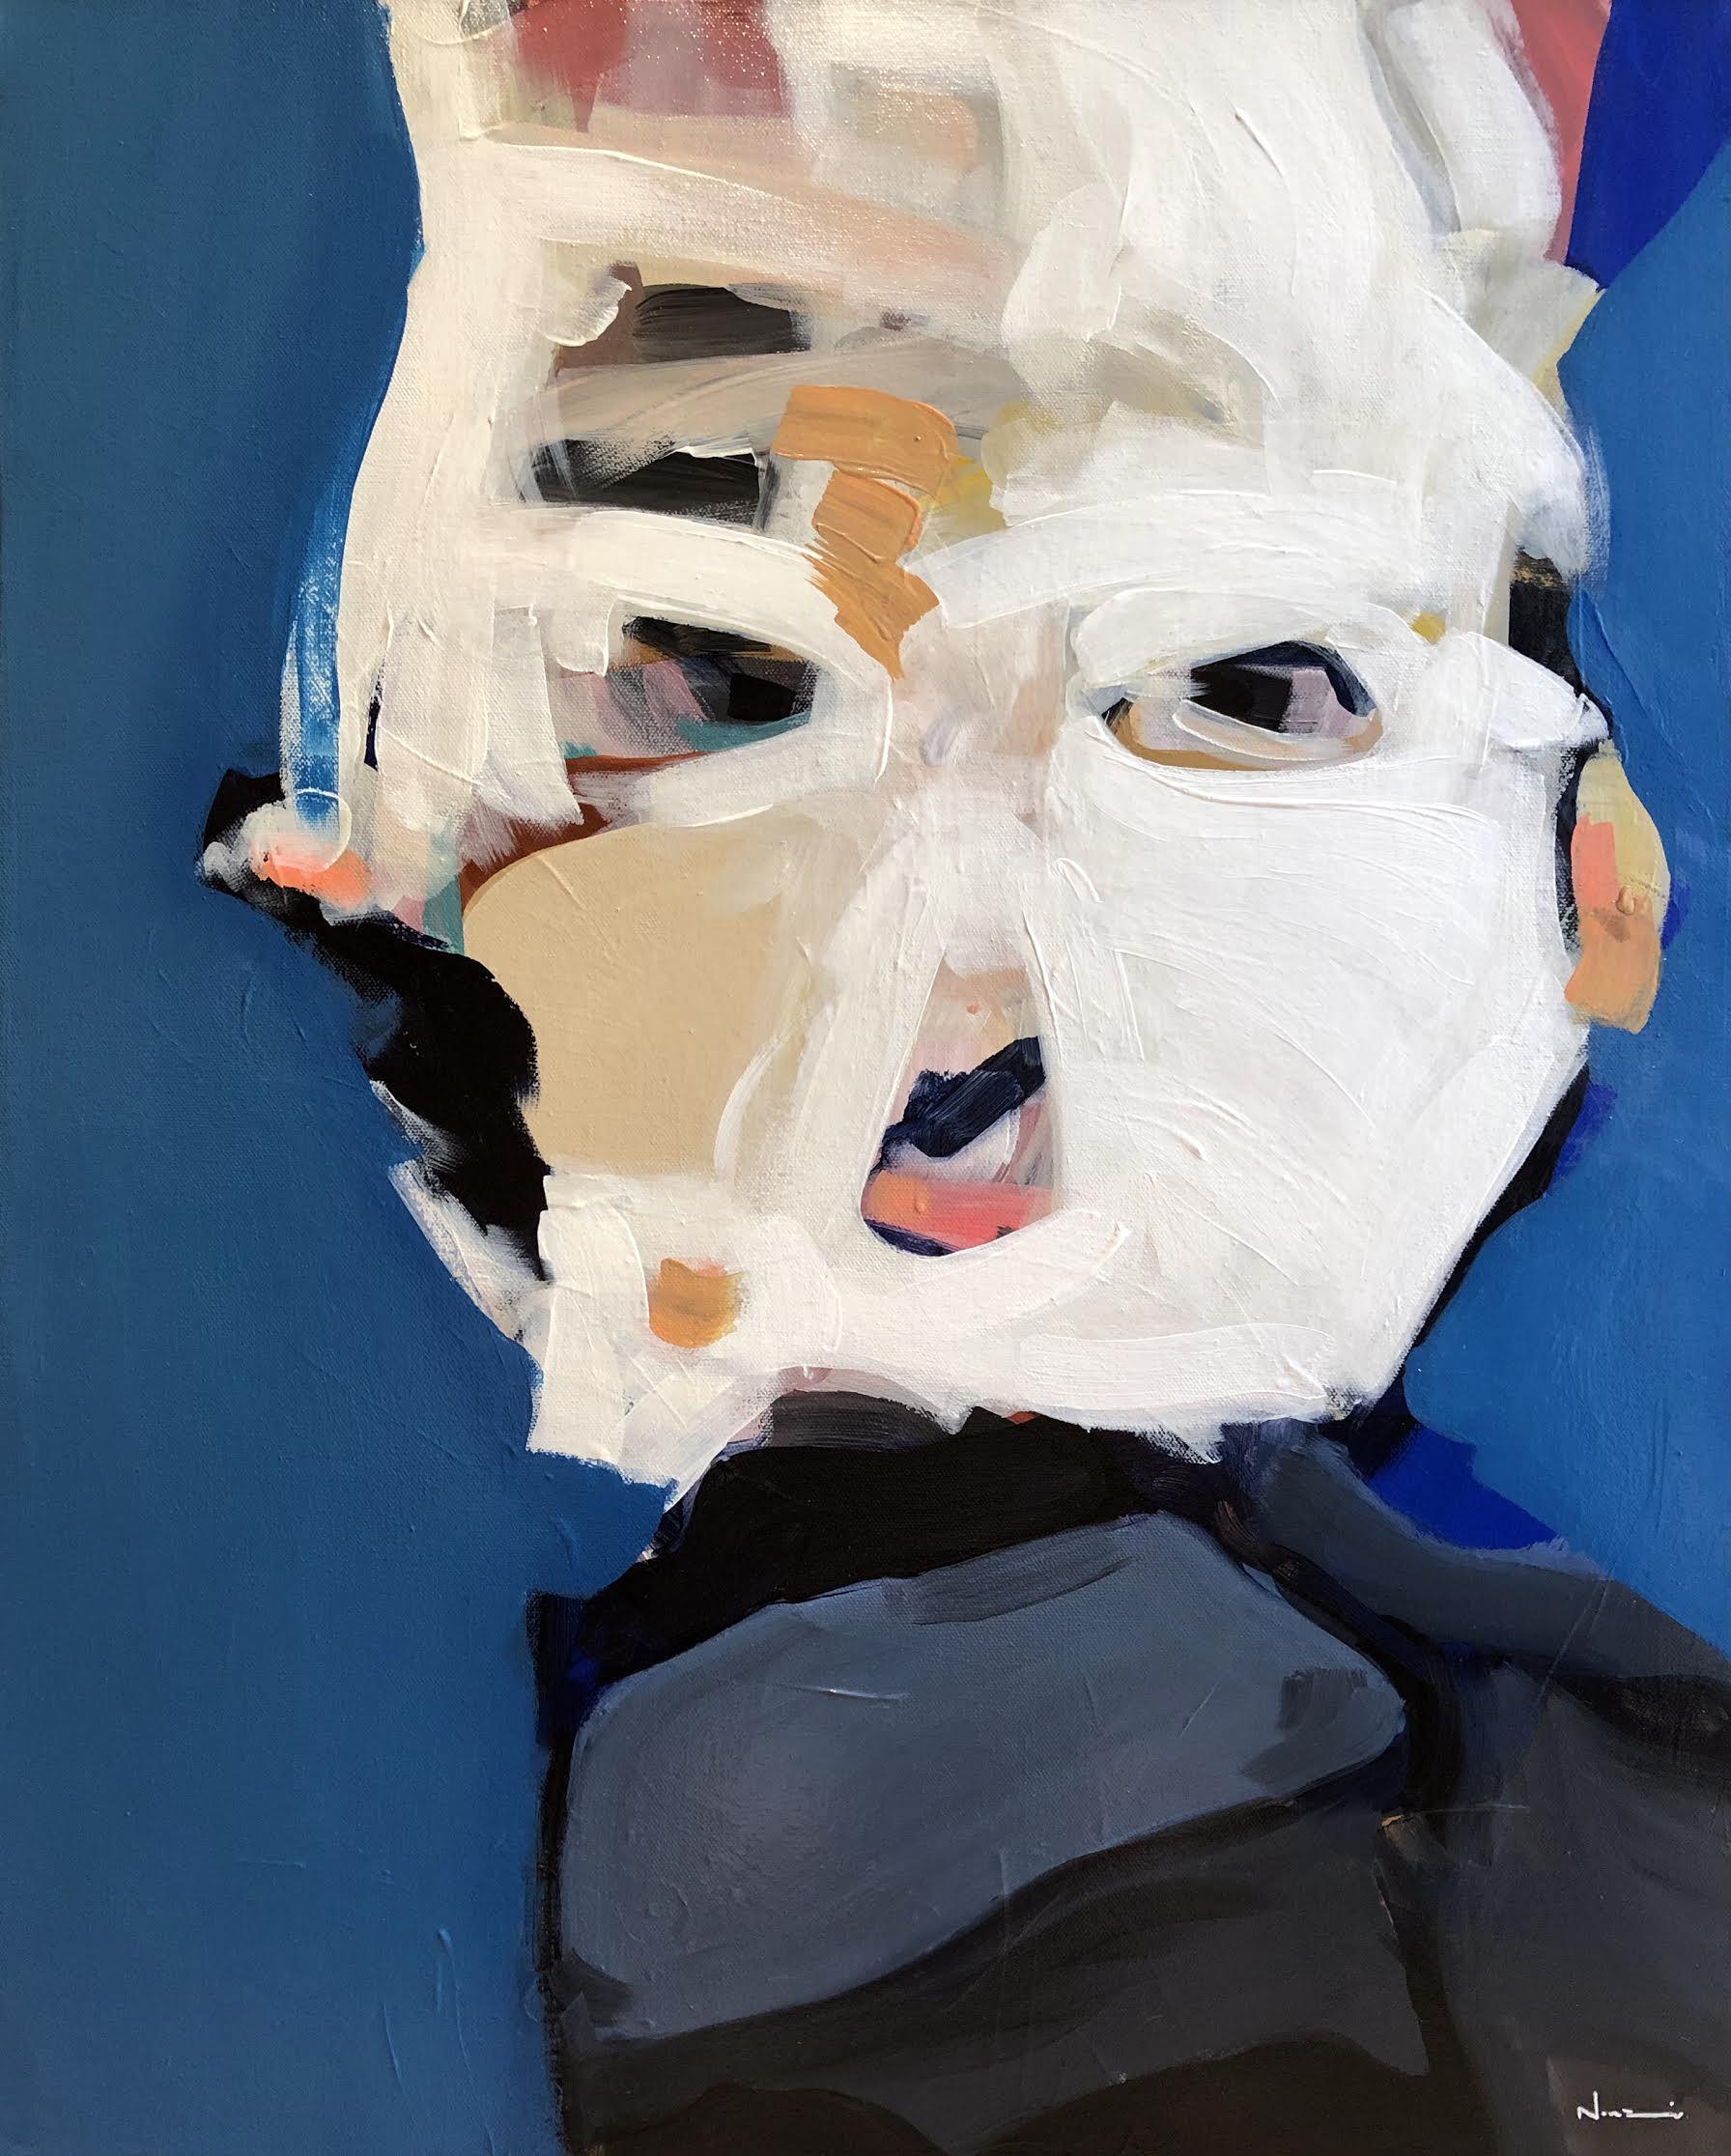 Nunzio Miano,  Bound By The Past , 2019. Acrylic on canvas, 80cm(h) x 65cm(w), $2200.